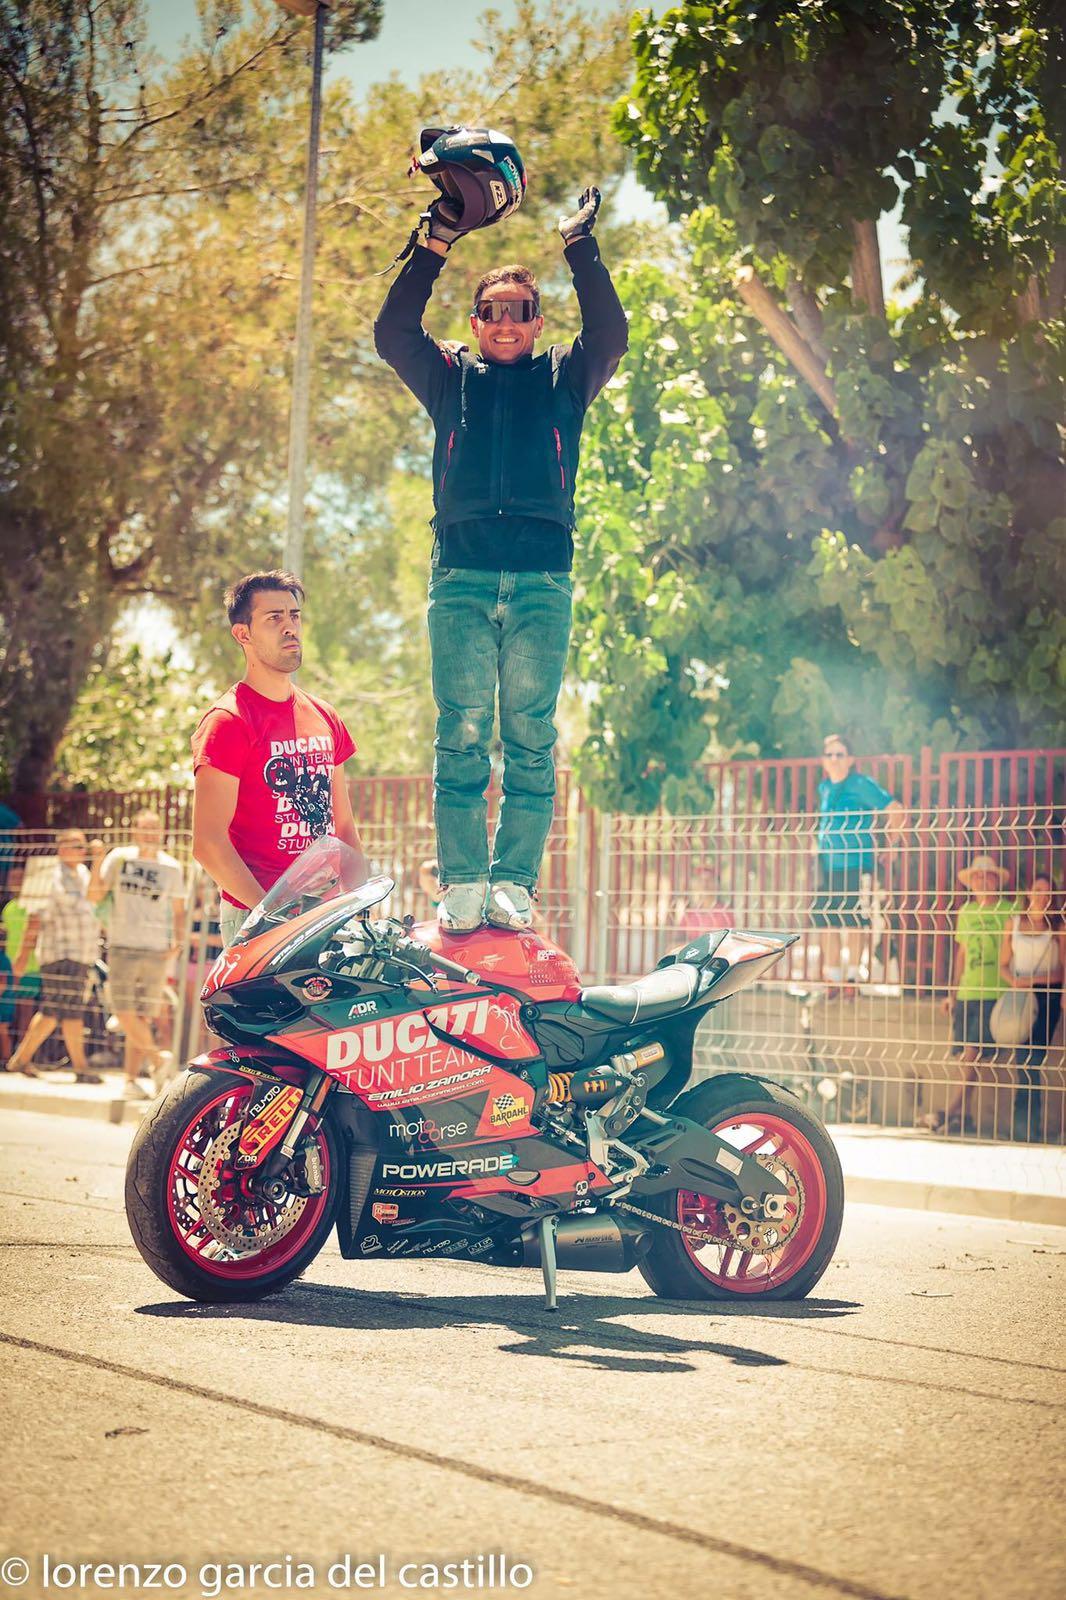 5-sixty-rider-festival_2016_julian_simon_club_emilio_zamora_ducati_stunt_team_motor_show_freestyle_moto_espectaculo_exhibicion_final_powerade_arriba_gracias_agradecimiento_feliz_smile_happy